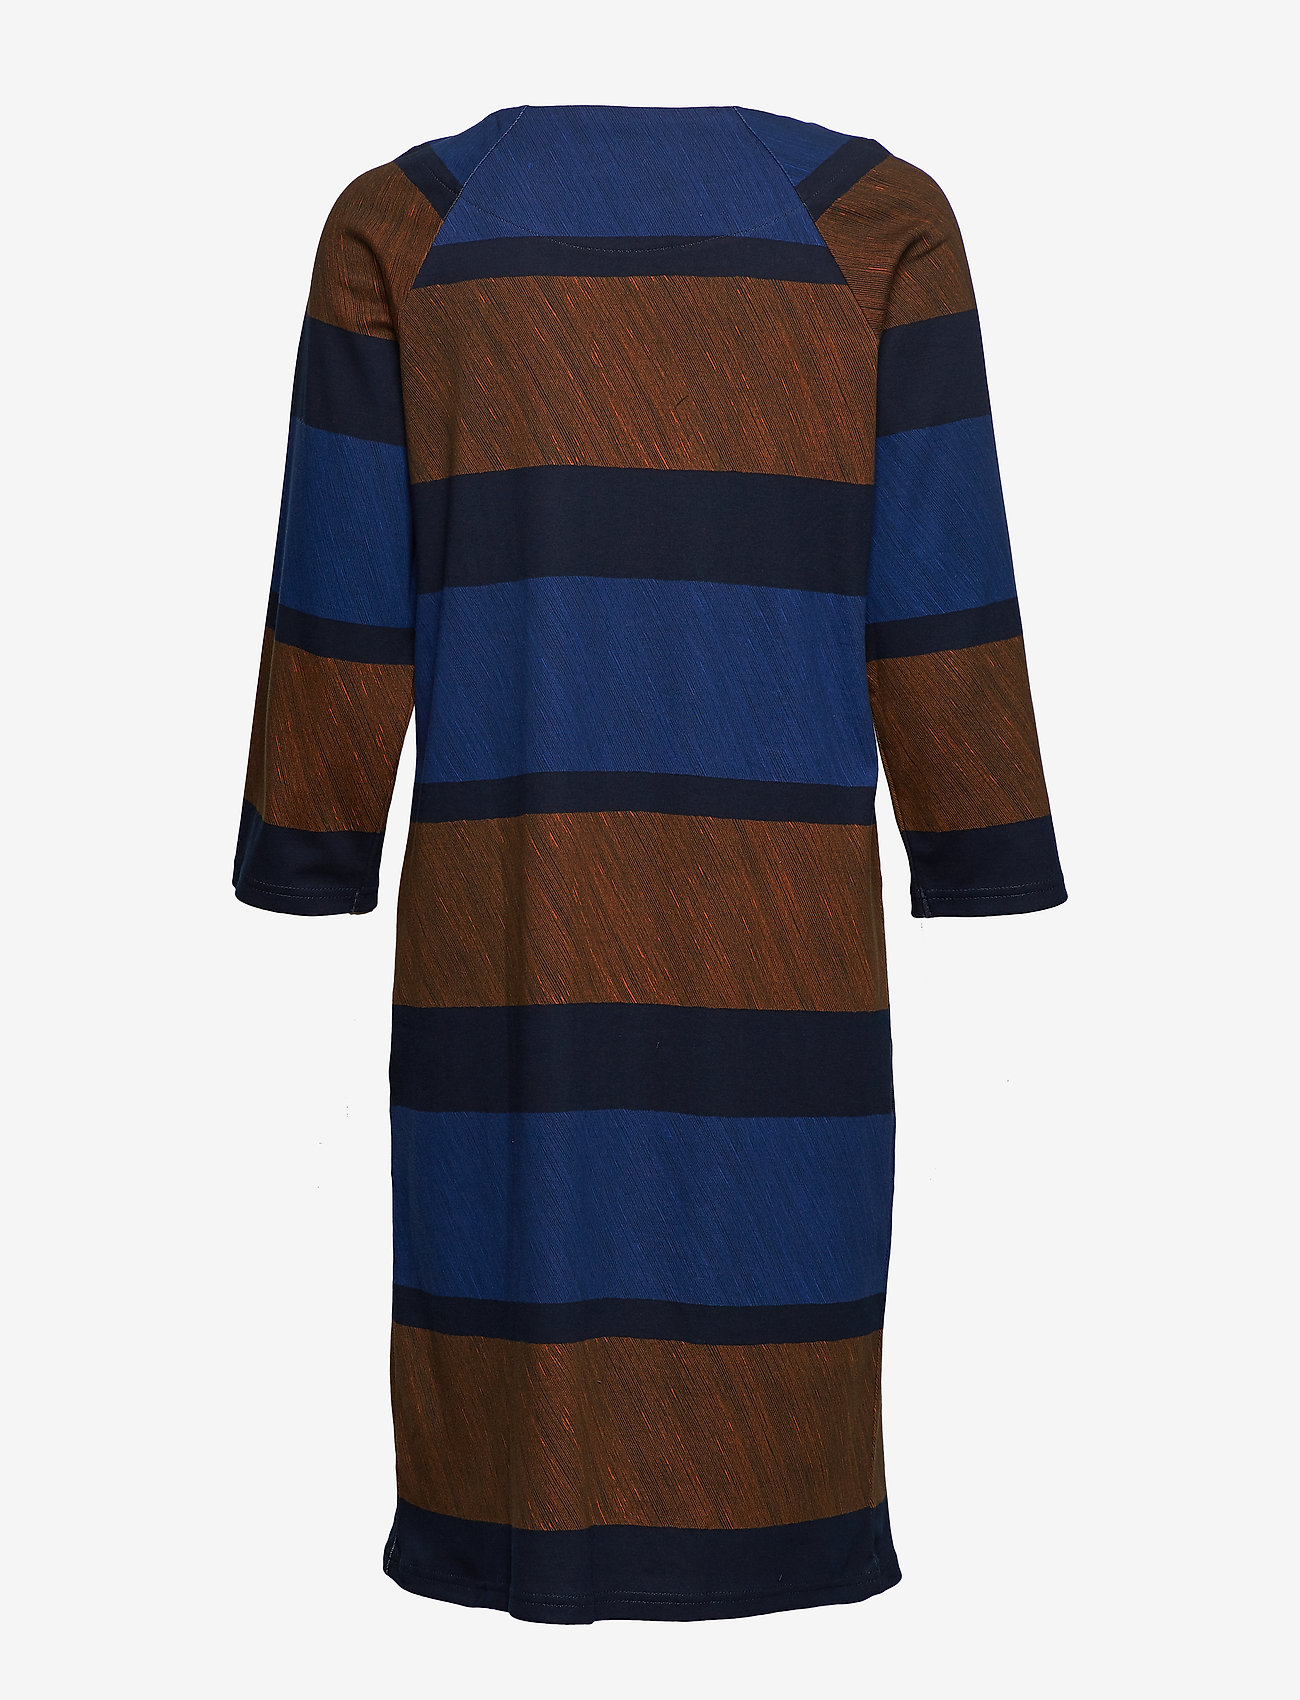 Nanso - Ladies dress, Puomi - midi kjoler - blue - 1